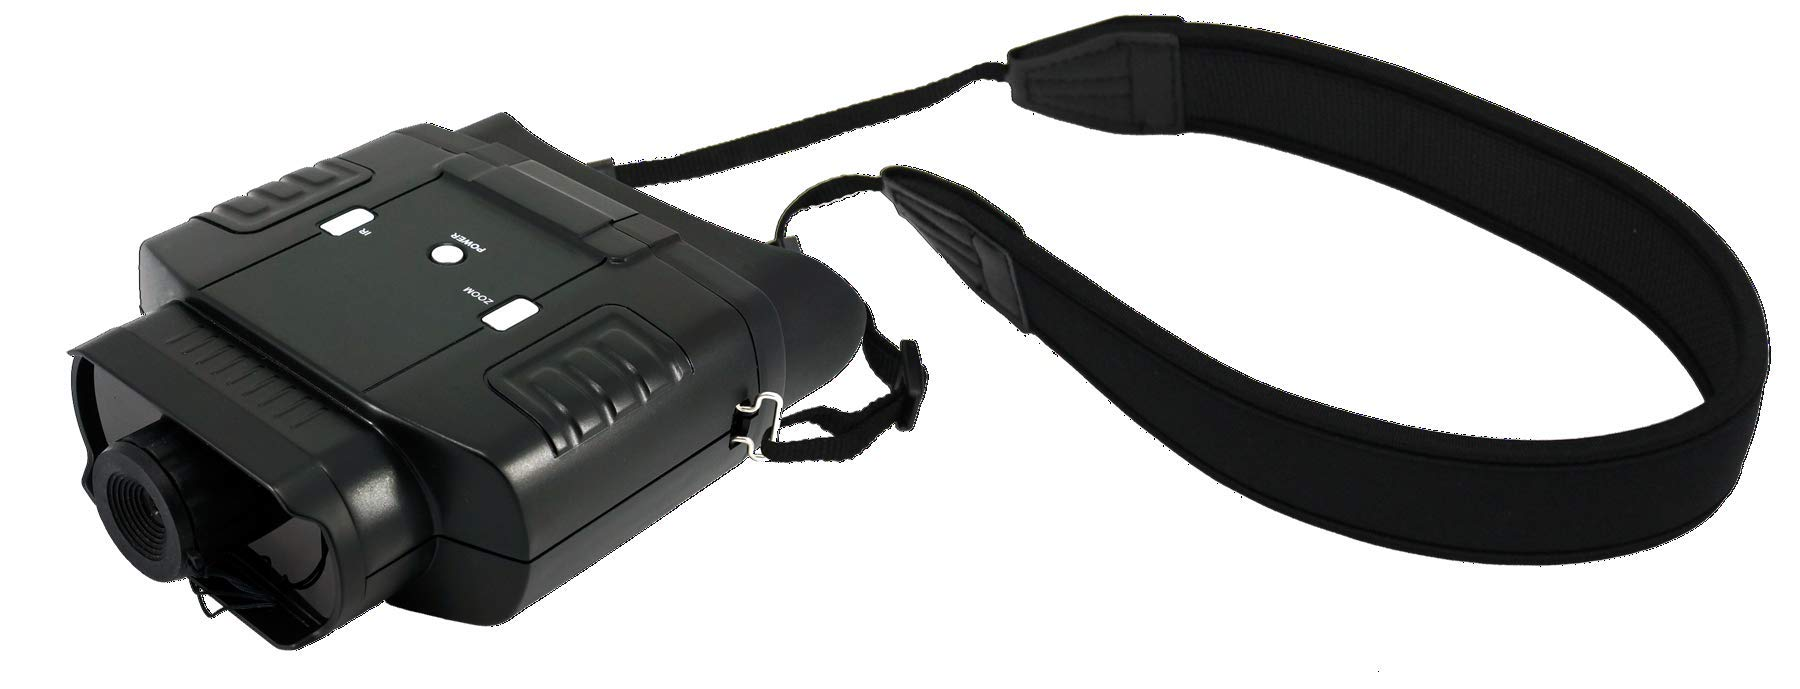 Sniper Digital Zoom 2X Deluxe Night Vision Binoculars by Sniper